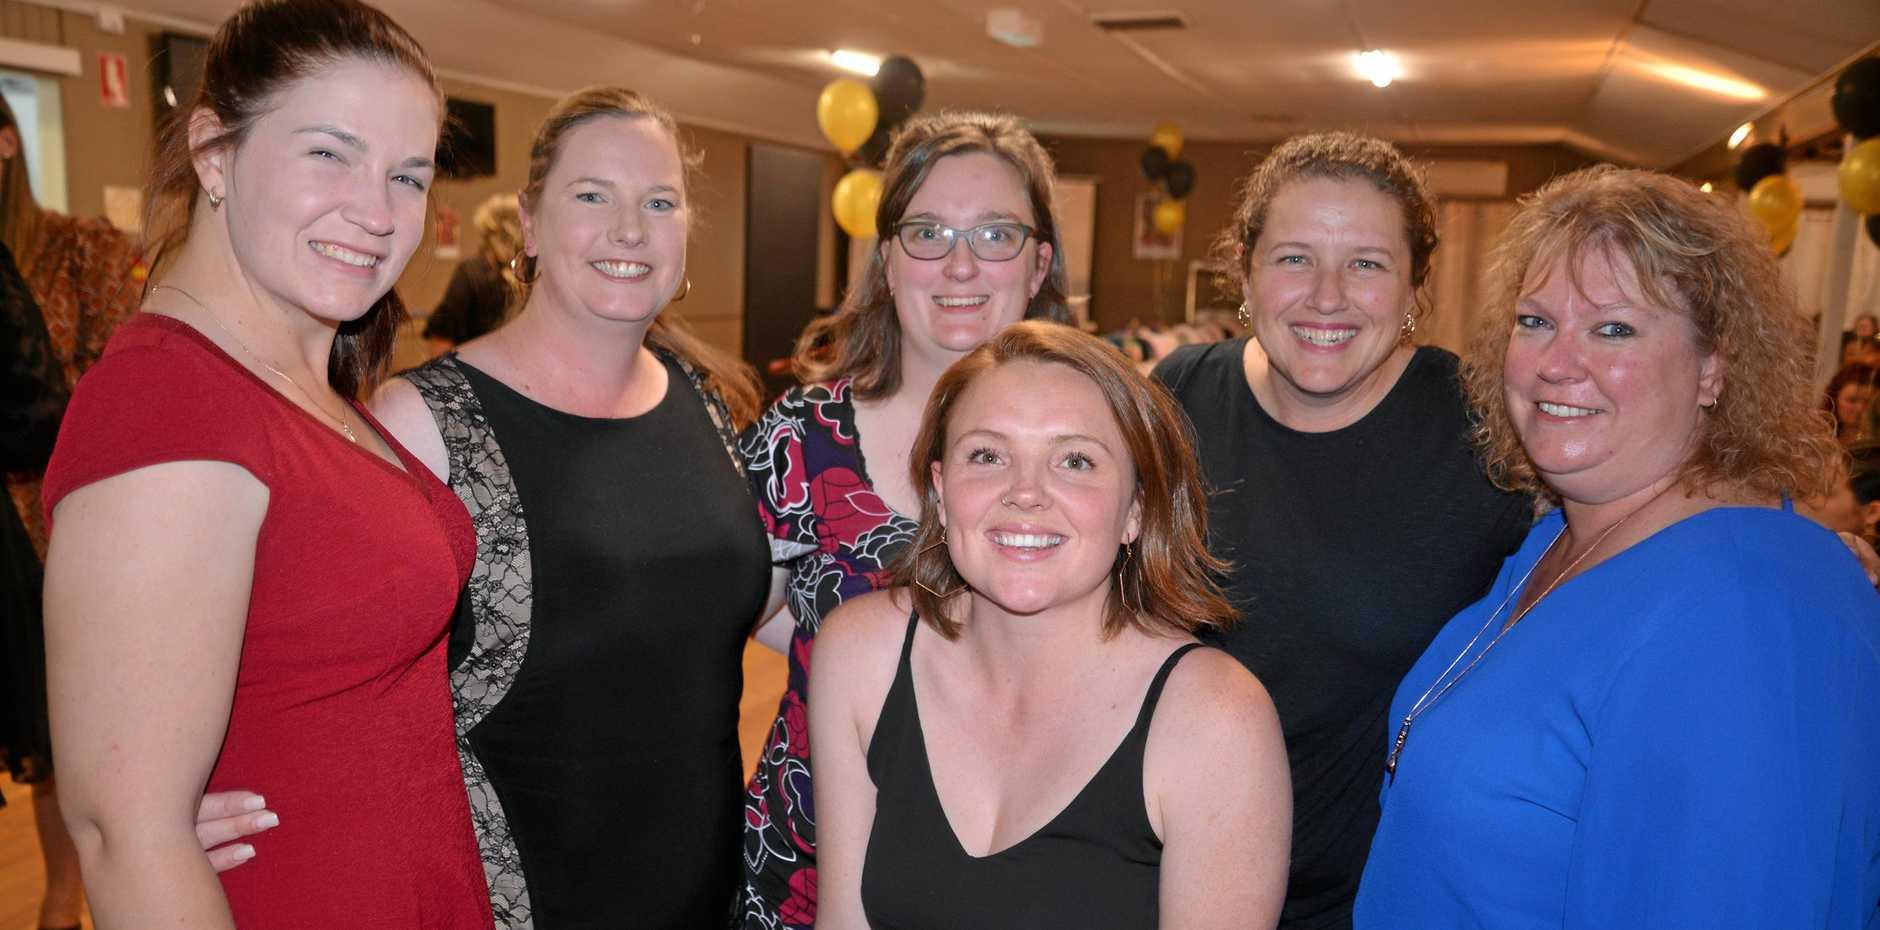 Shelley's Steelers (from left) Katie McCormick, Letitia Stuart, Zandie Stuart, Georgia Venables, Jayne Shelley and Leanne Lockhart.